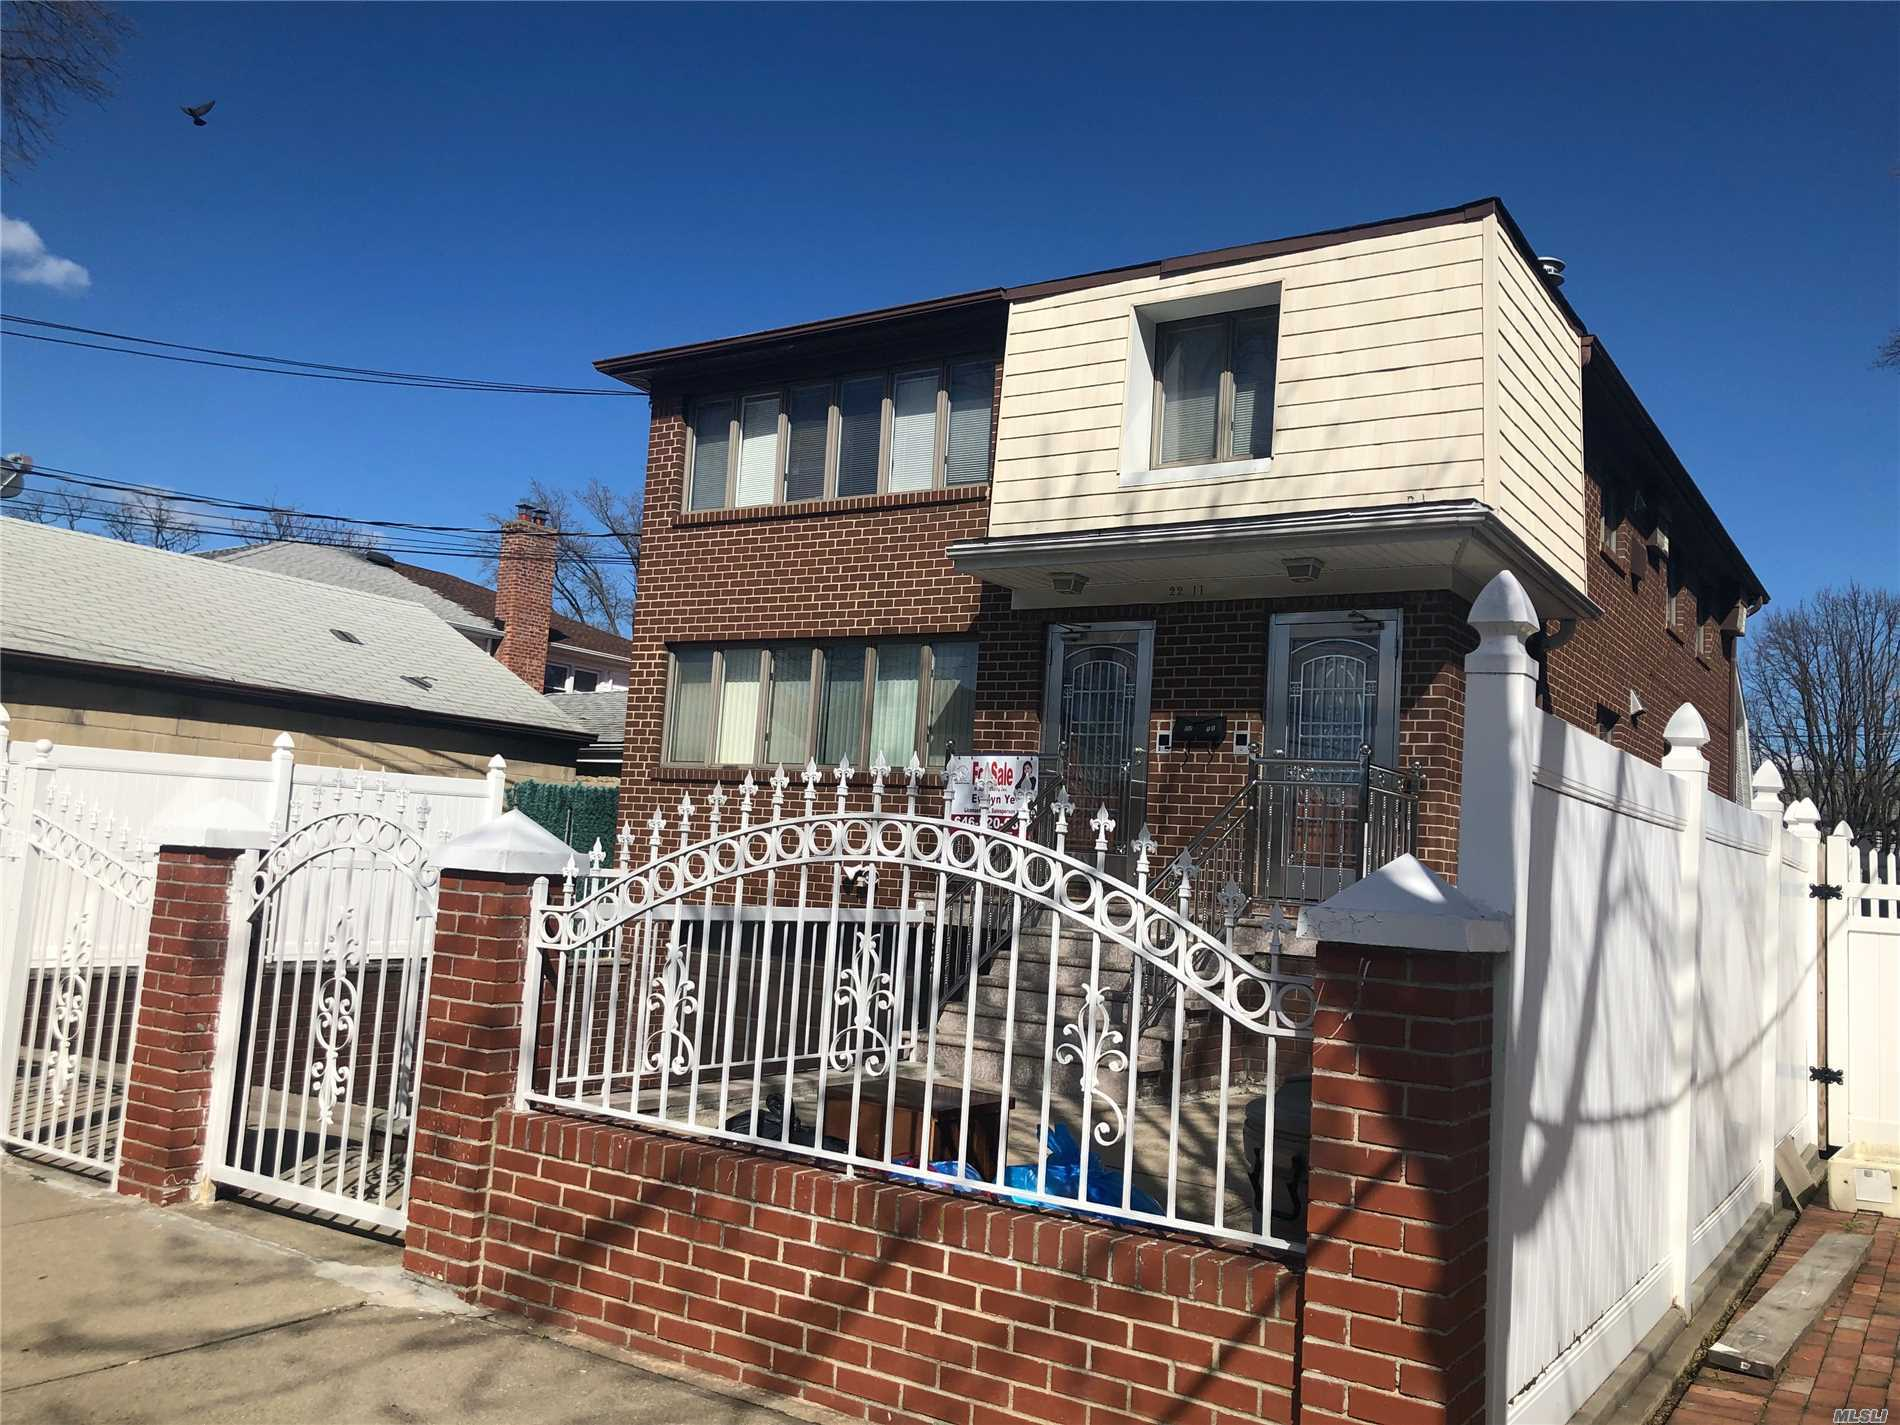 Property for sale at 22-11 lEE Street, Whitestone NY 11357, Whitestone,  New York 11357